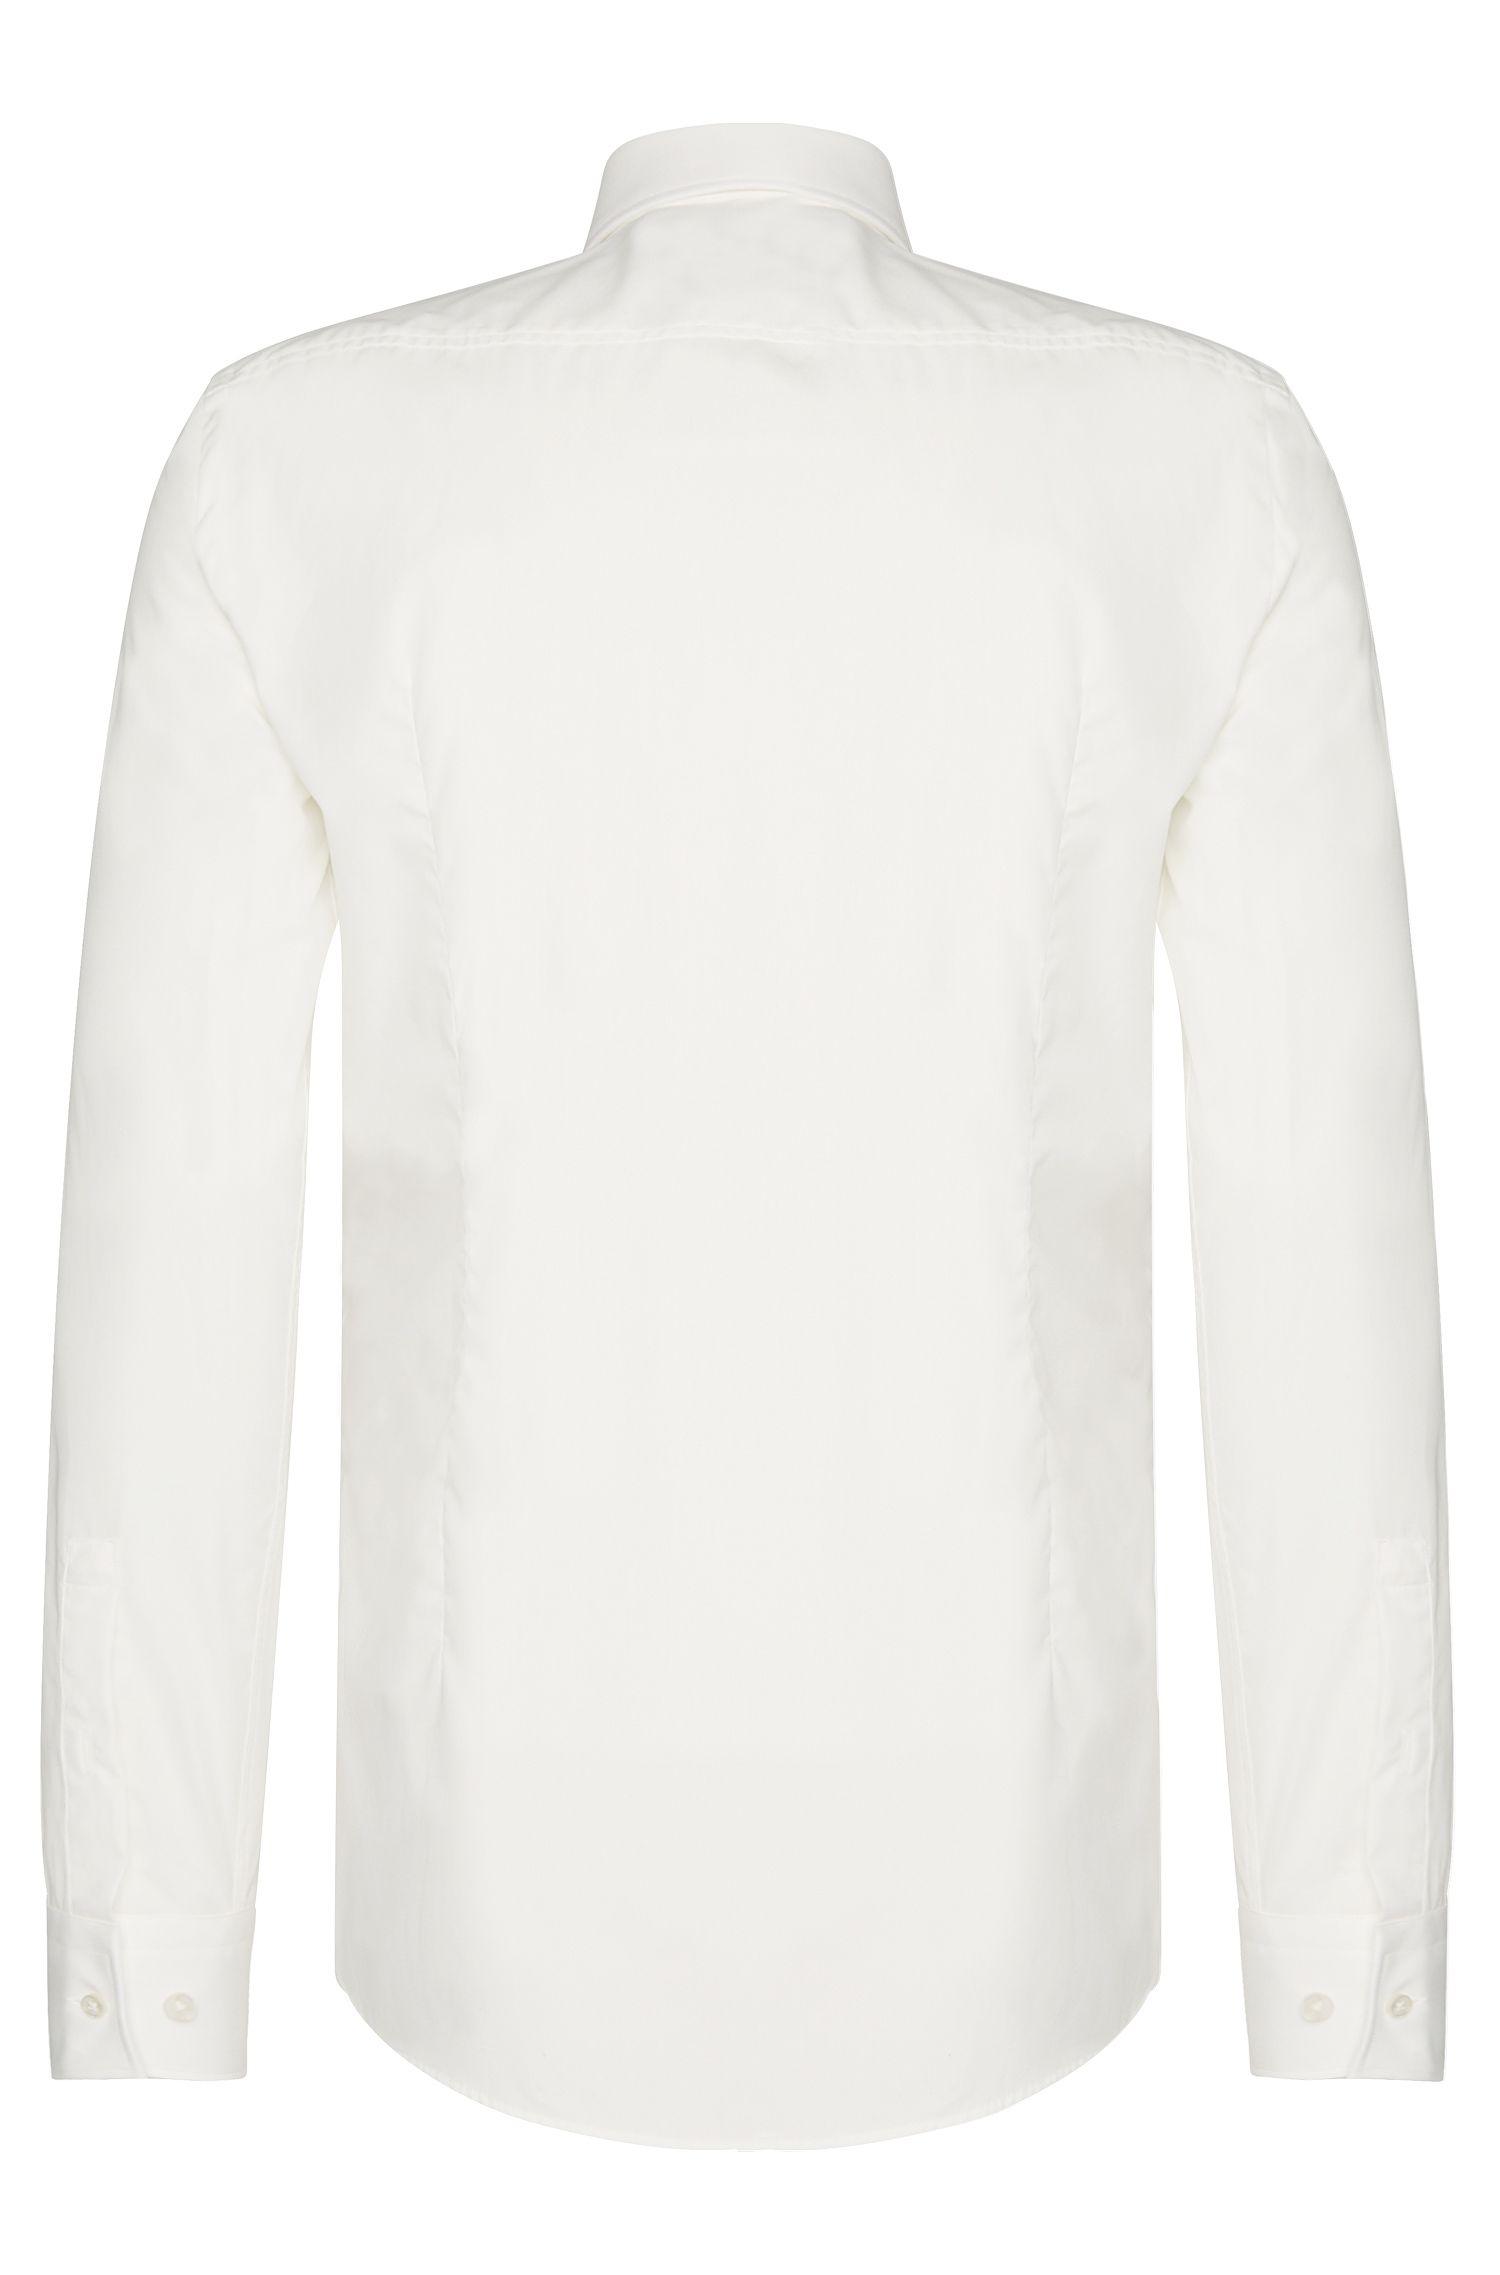 Unifarbenes Slim-Fit Hemd aus Baumwolle: 'Jenno', Natur